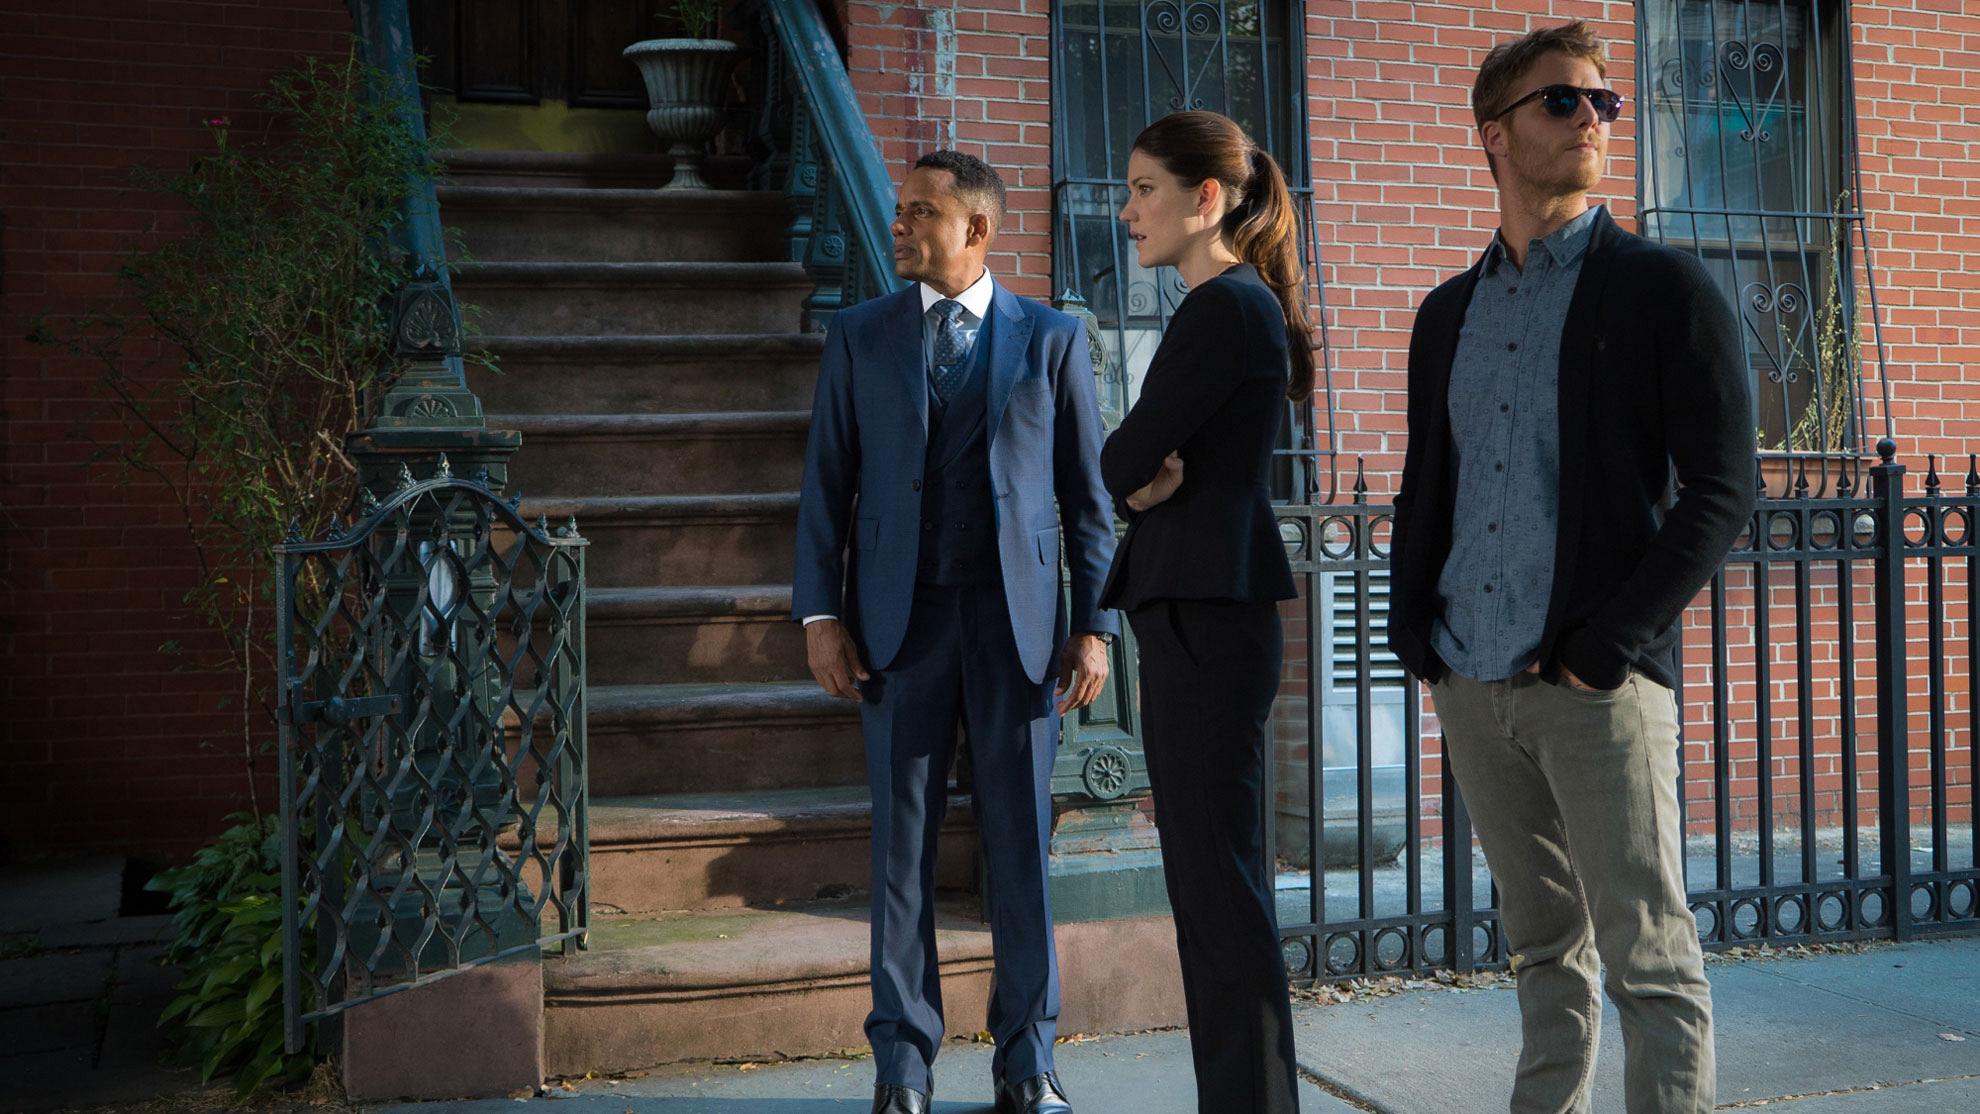 Hill Harper as Agent Spelman Boyle, Jennifer Carpenter as Agent Rebecca Harris, and Jake McDorman as Brian Finch